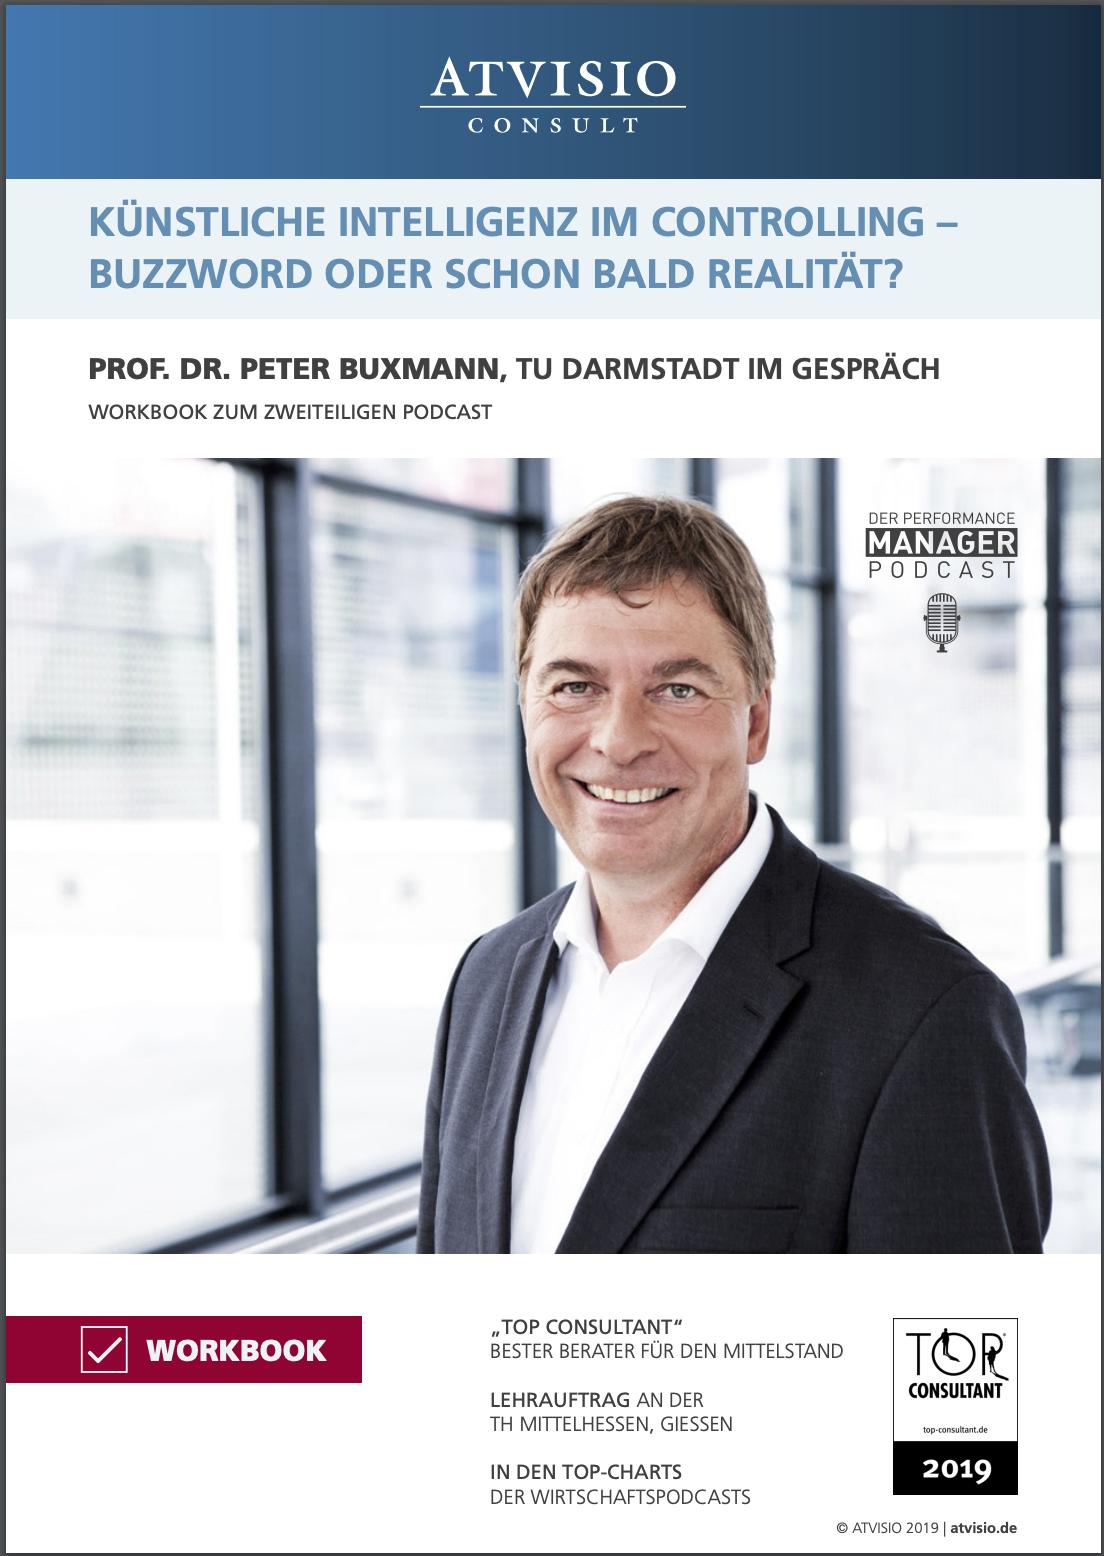 ATVISIO Cover Workbook Buxmann